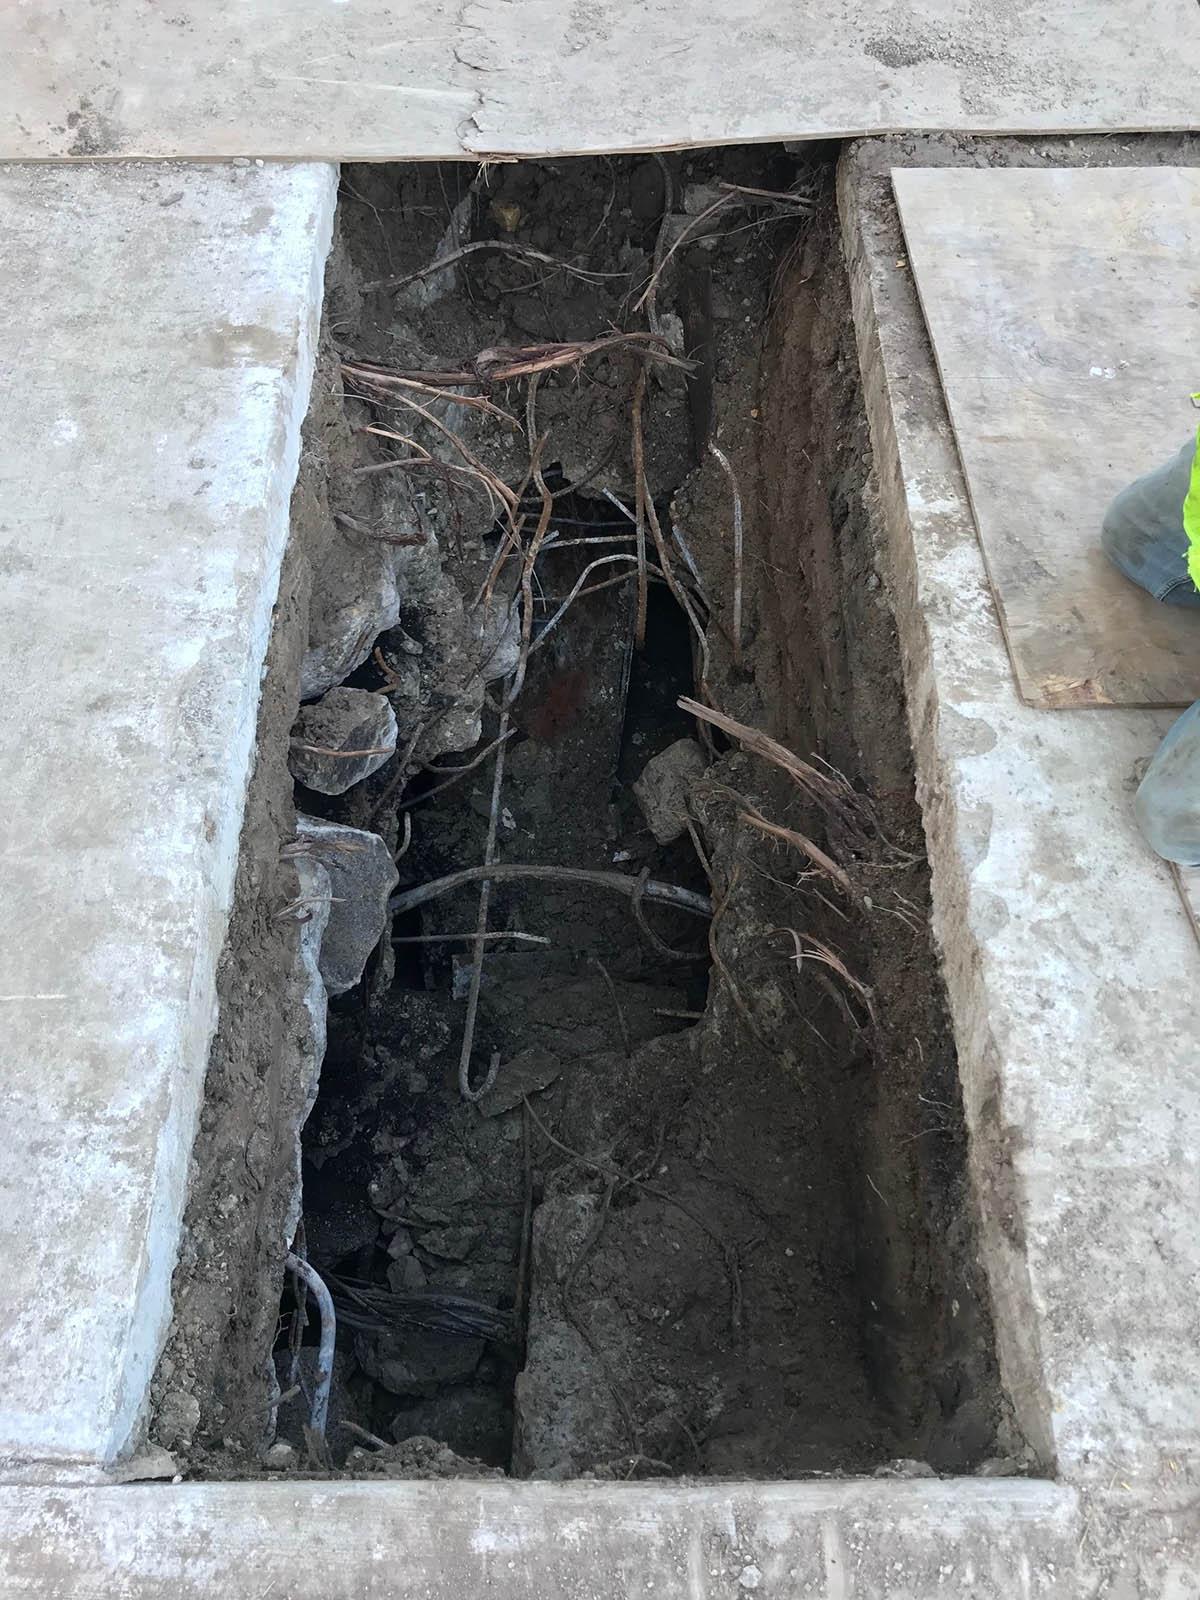 Tunnel hole